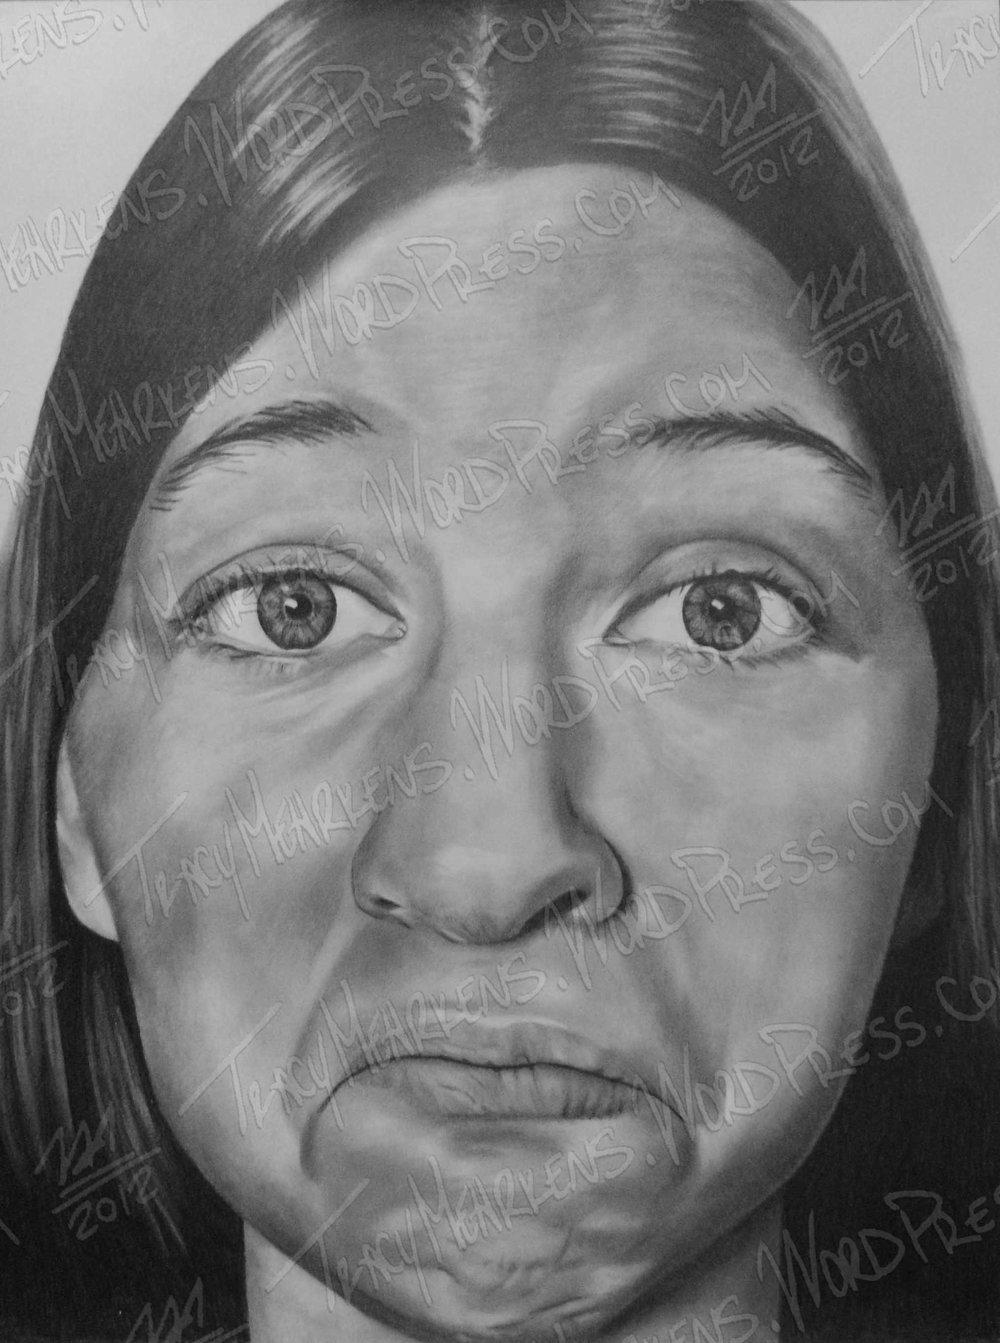 Self. Graphite on Paper. 18x24 in. 2012.